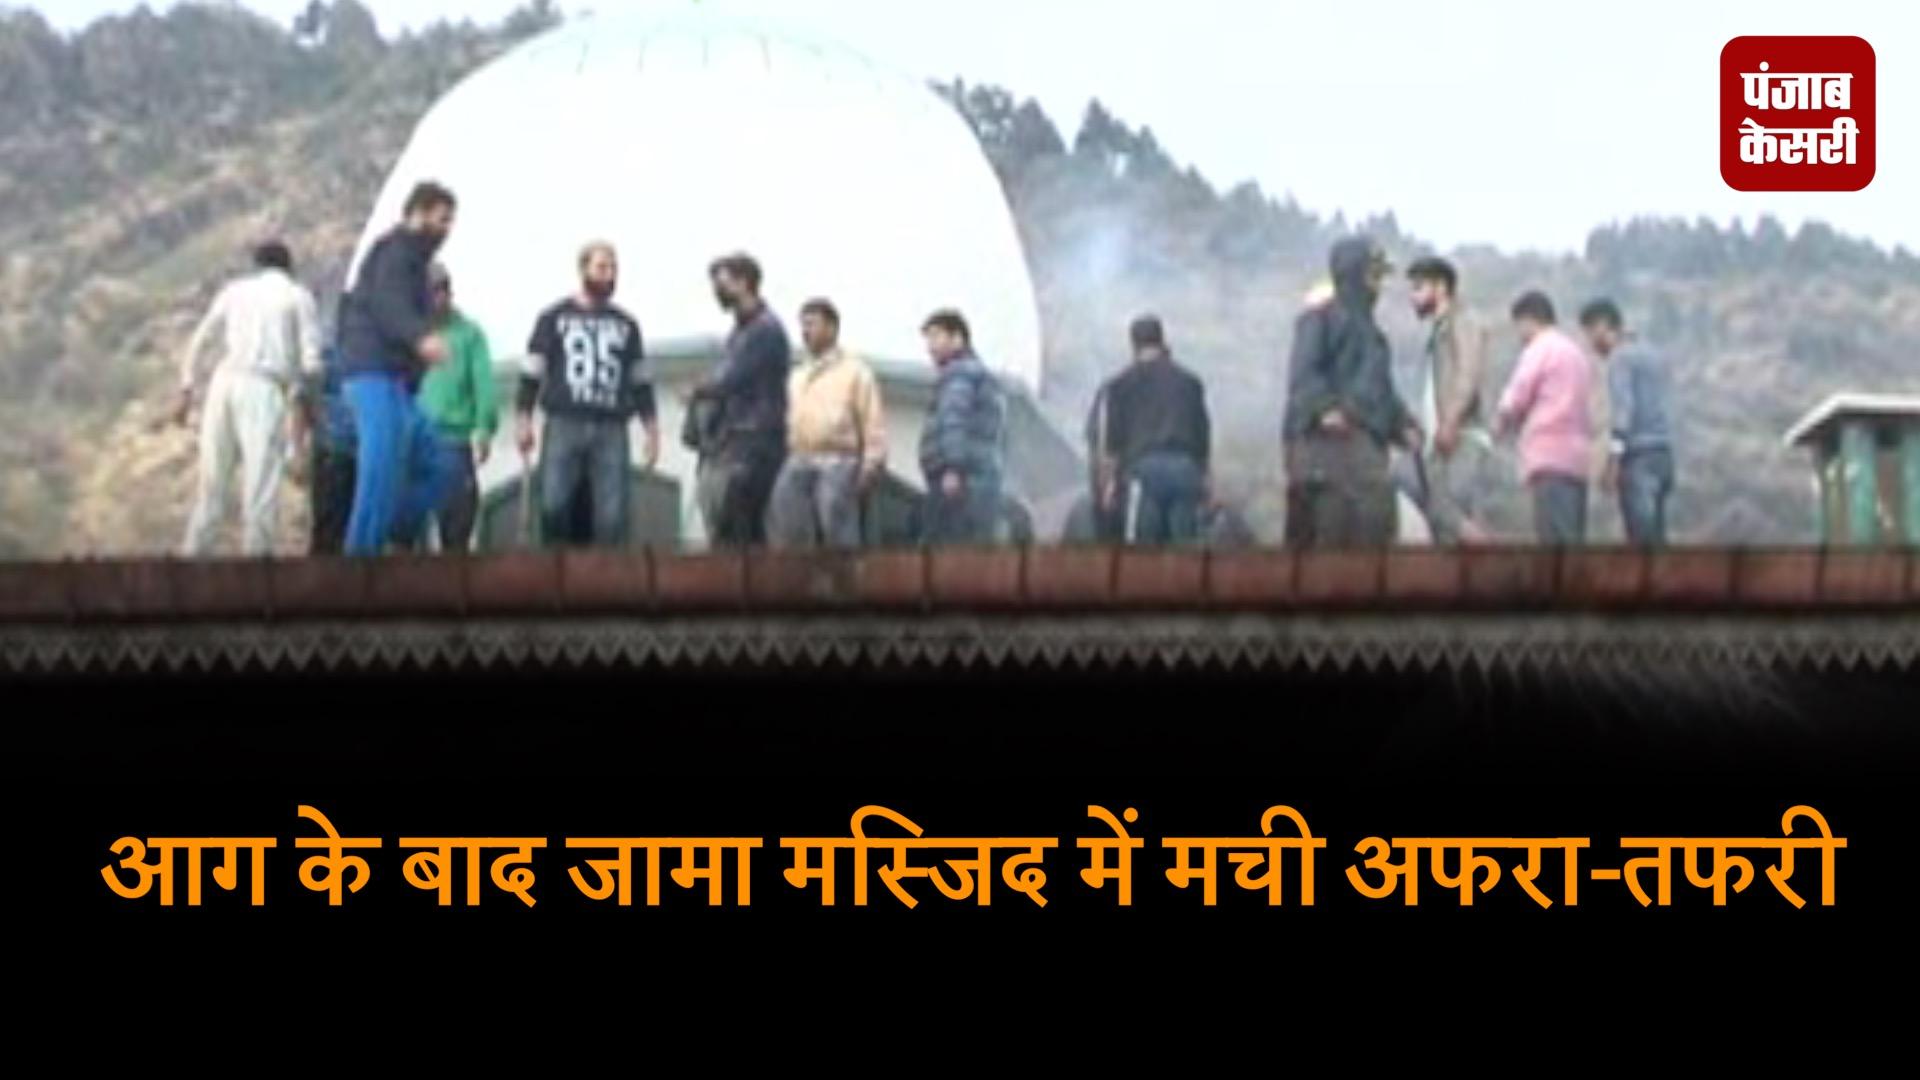 श्रीनगर की जामा मस्जिद में लगी आग, मची...